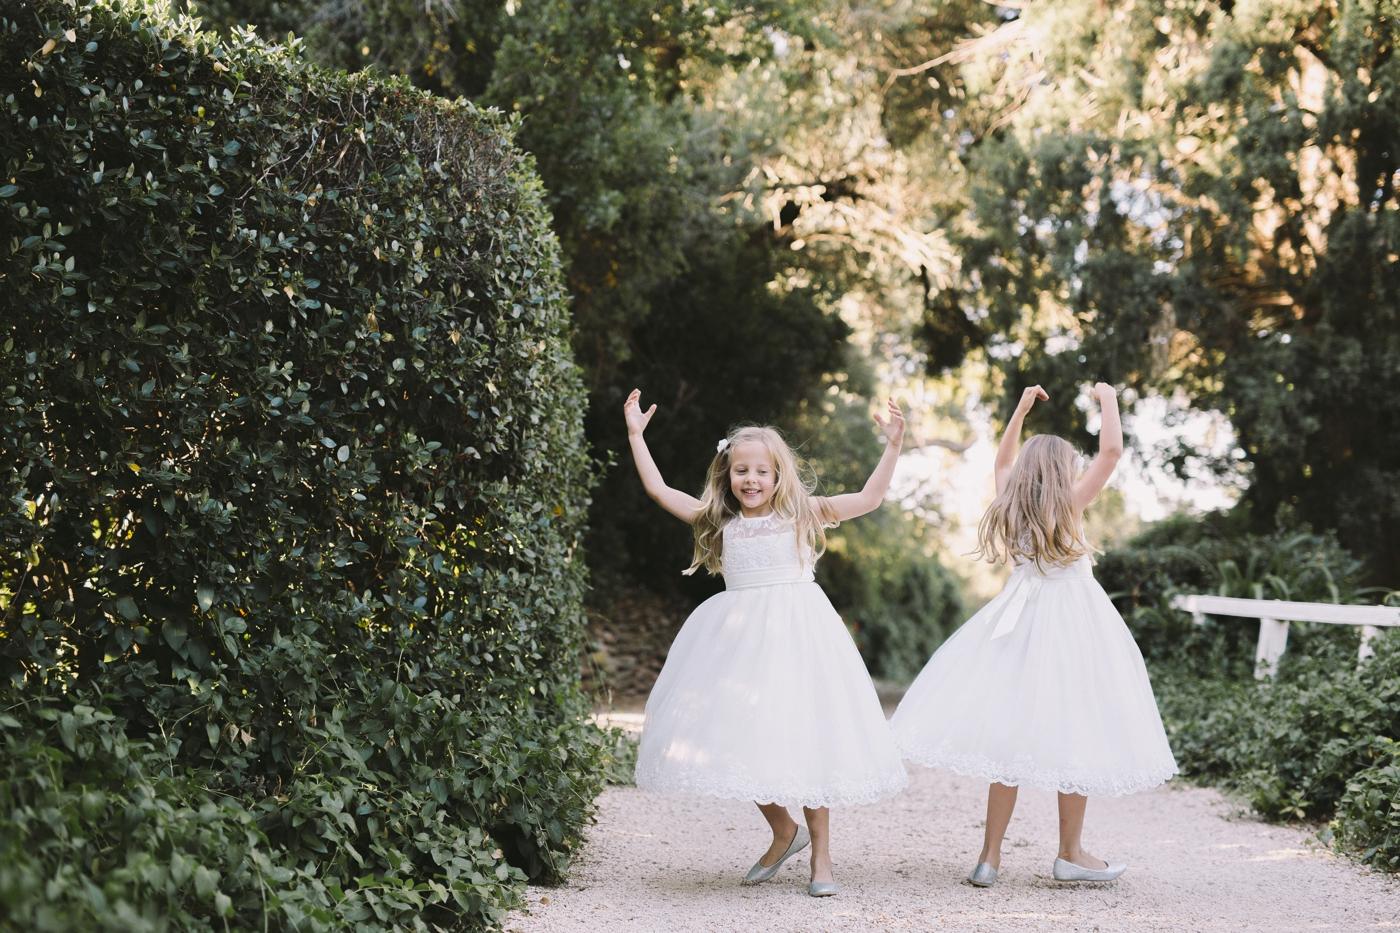 Lauren & Max - Marybank Estate Wedding - Natural wedding photographer in Adelaide - www.katherineschultzphotography.com 91